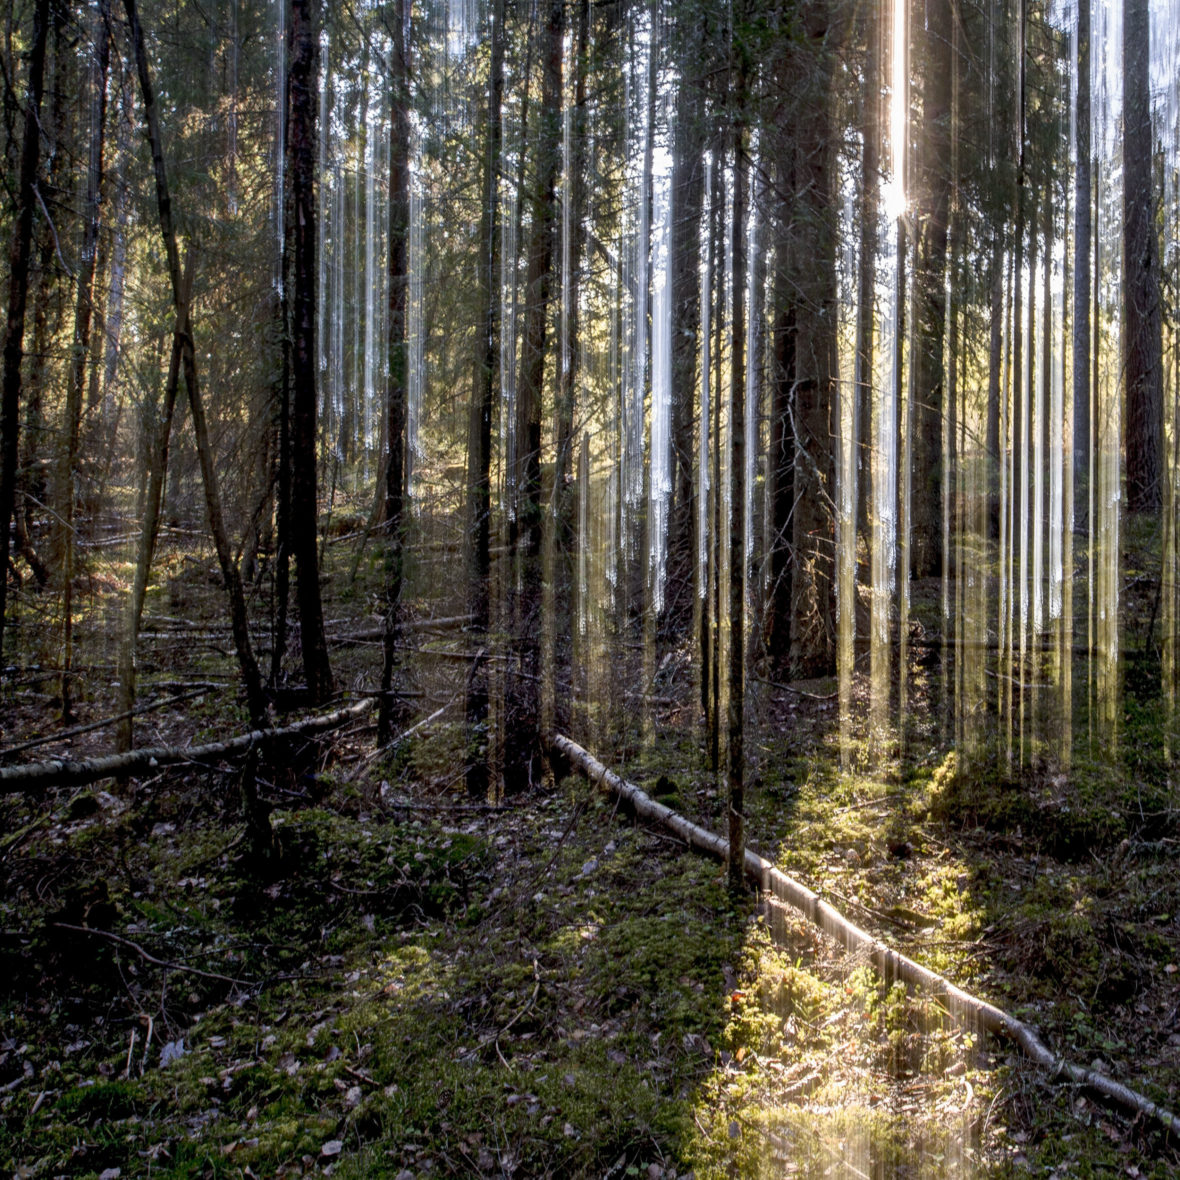 Aamuaurinko / Morning Sun